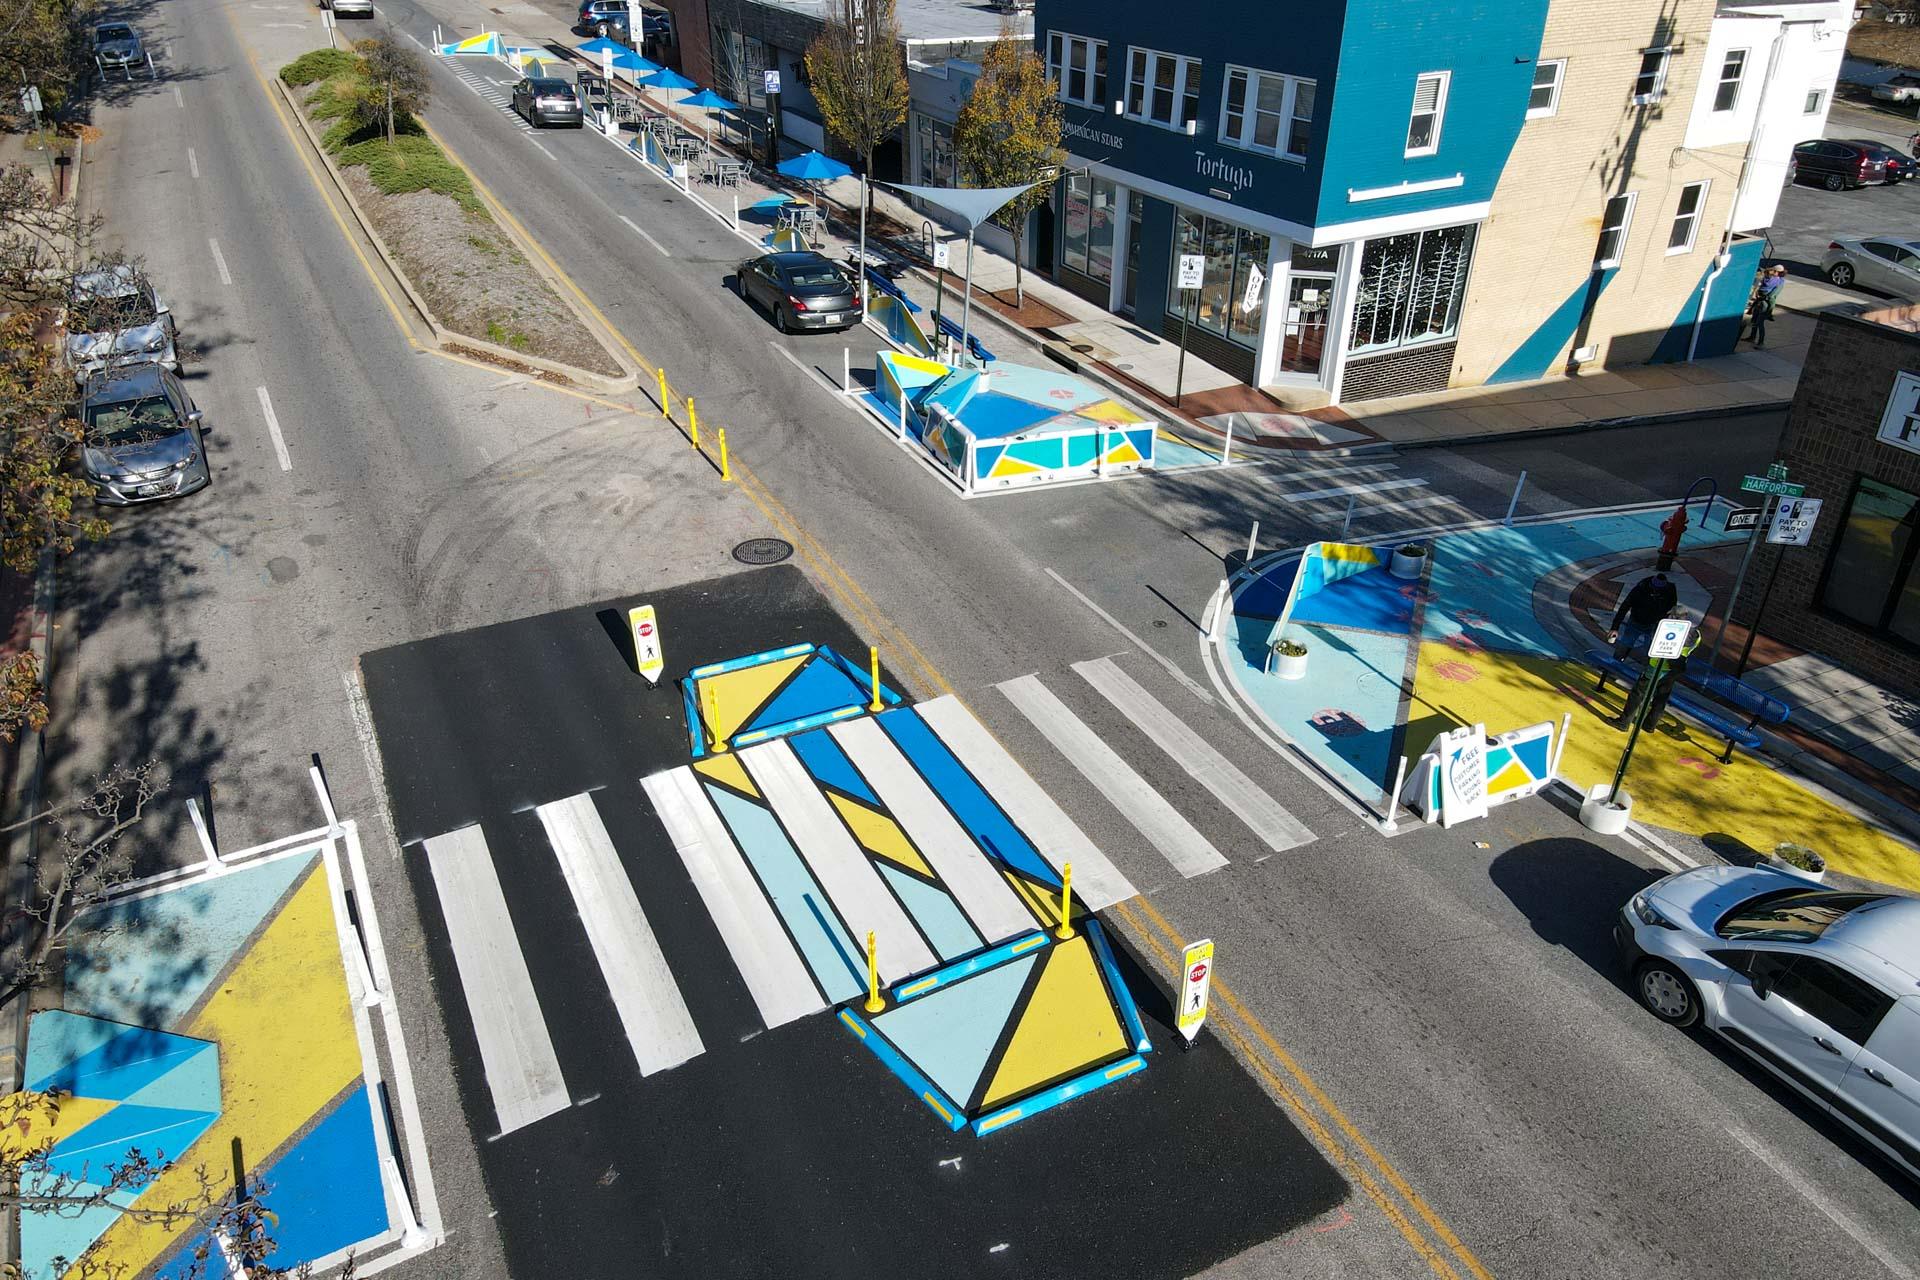 Design for Distancing Curbside Commons birdseye view of midblock crosswalk